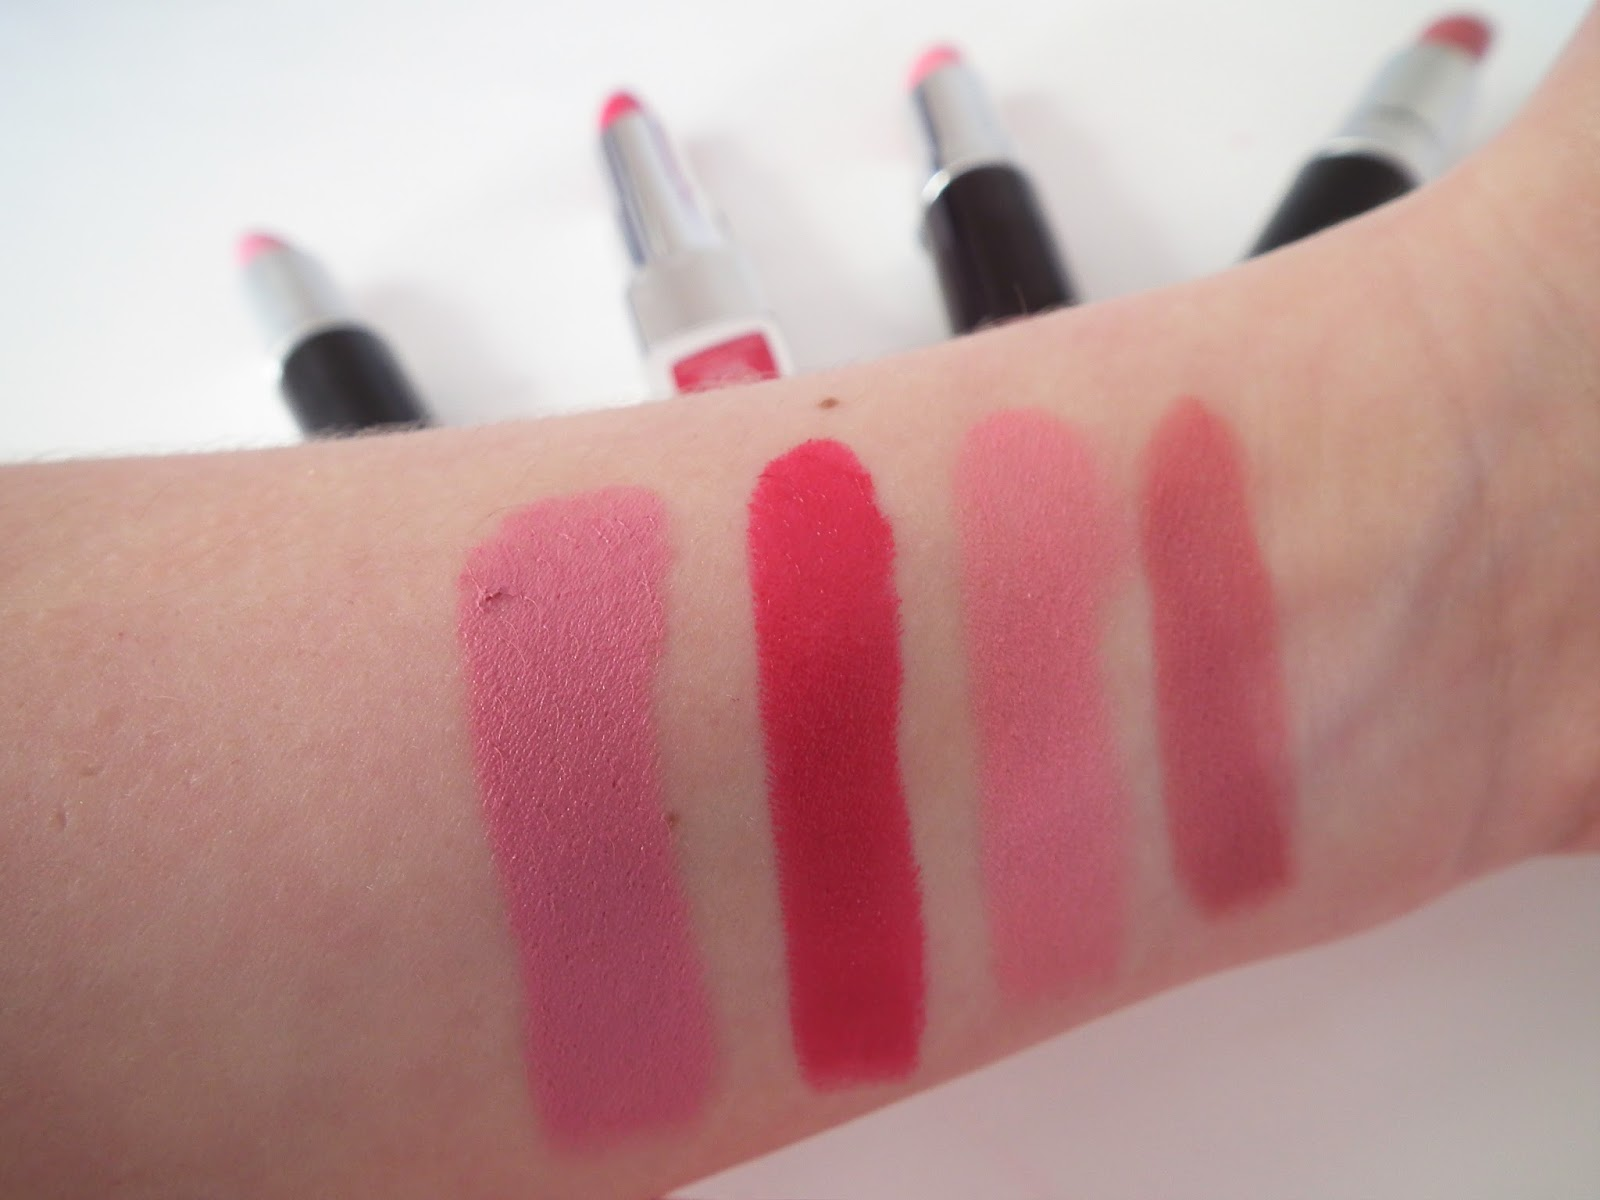 Spring Go To Lipsticks Swatches Mac - Snob, Rimmel - As You Want Victoria, Rimmel - Pink Blush, Mac - Brave